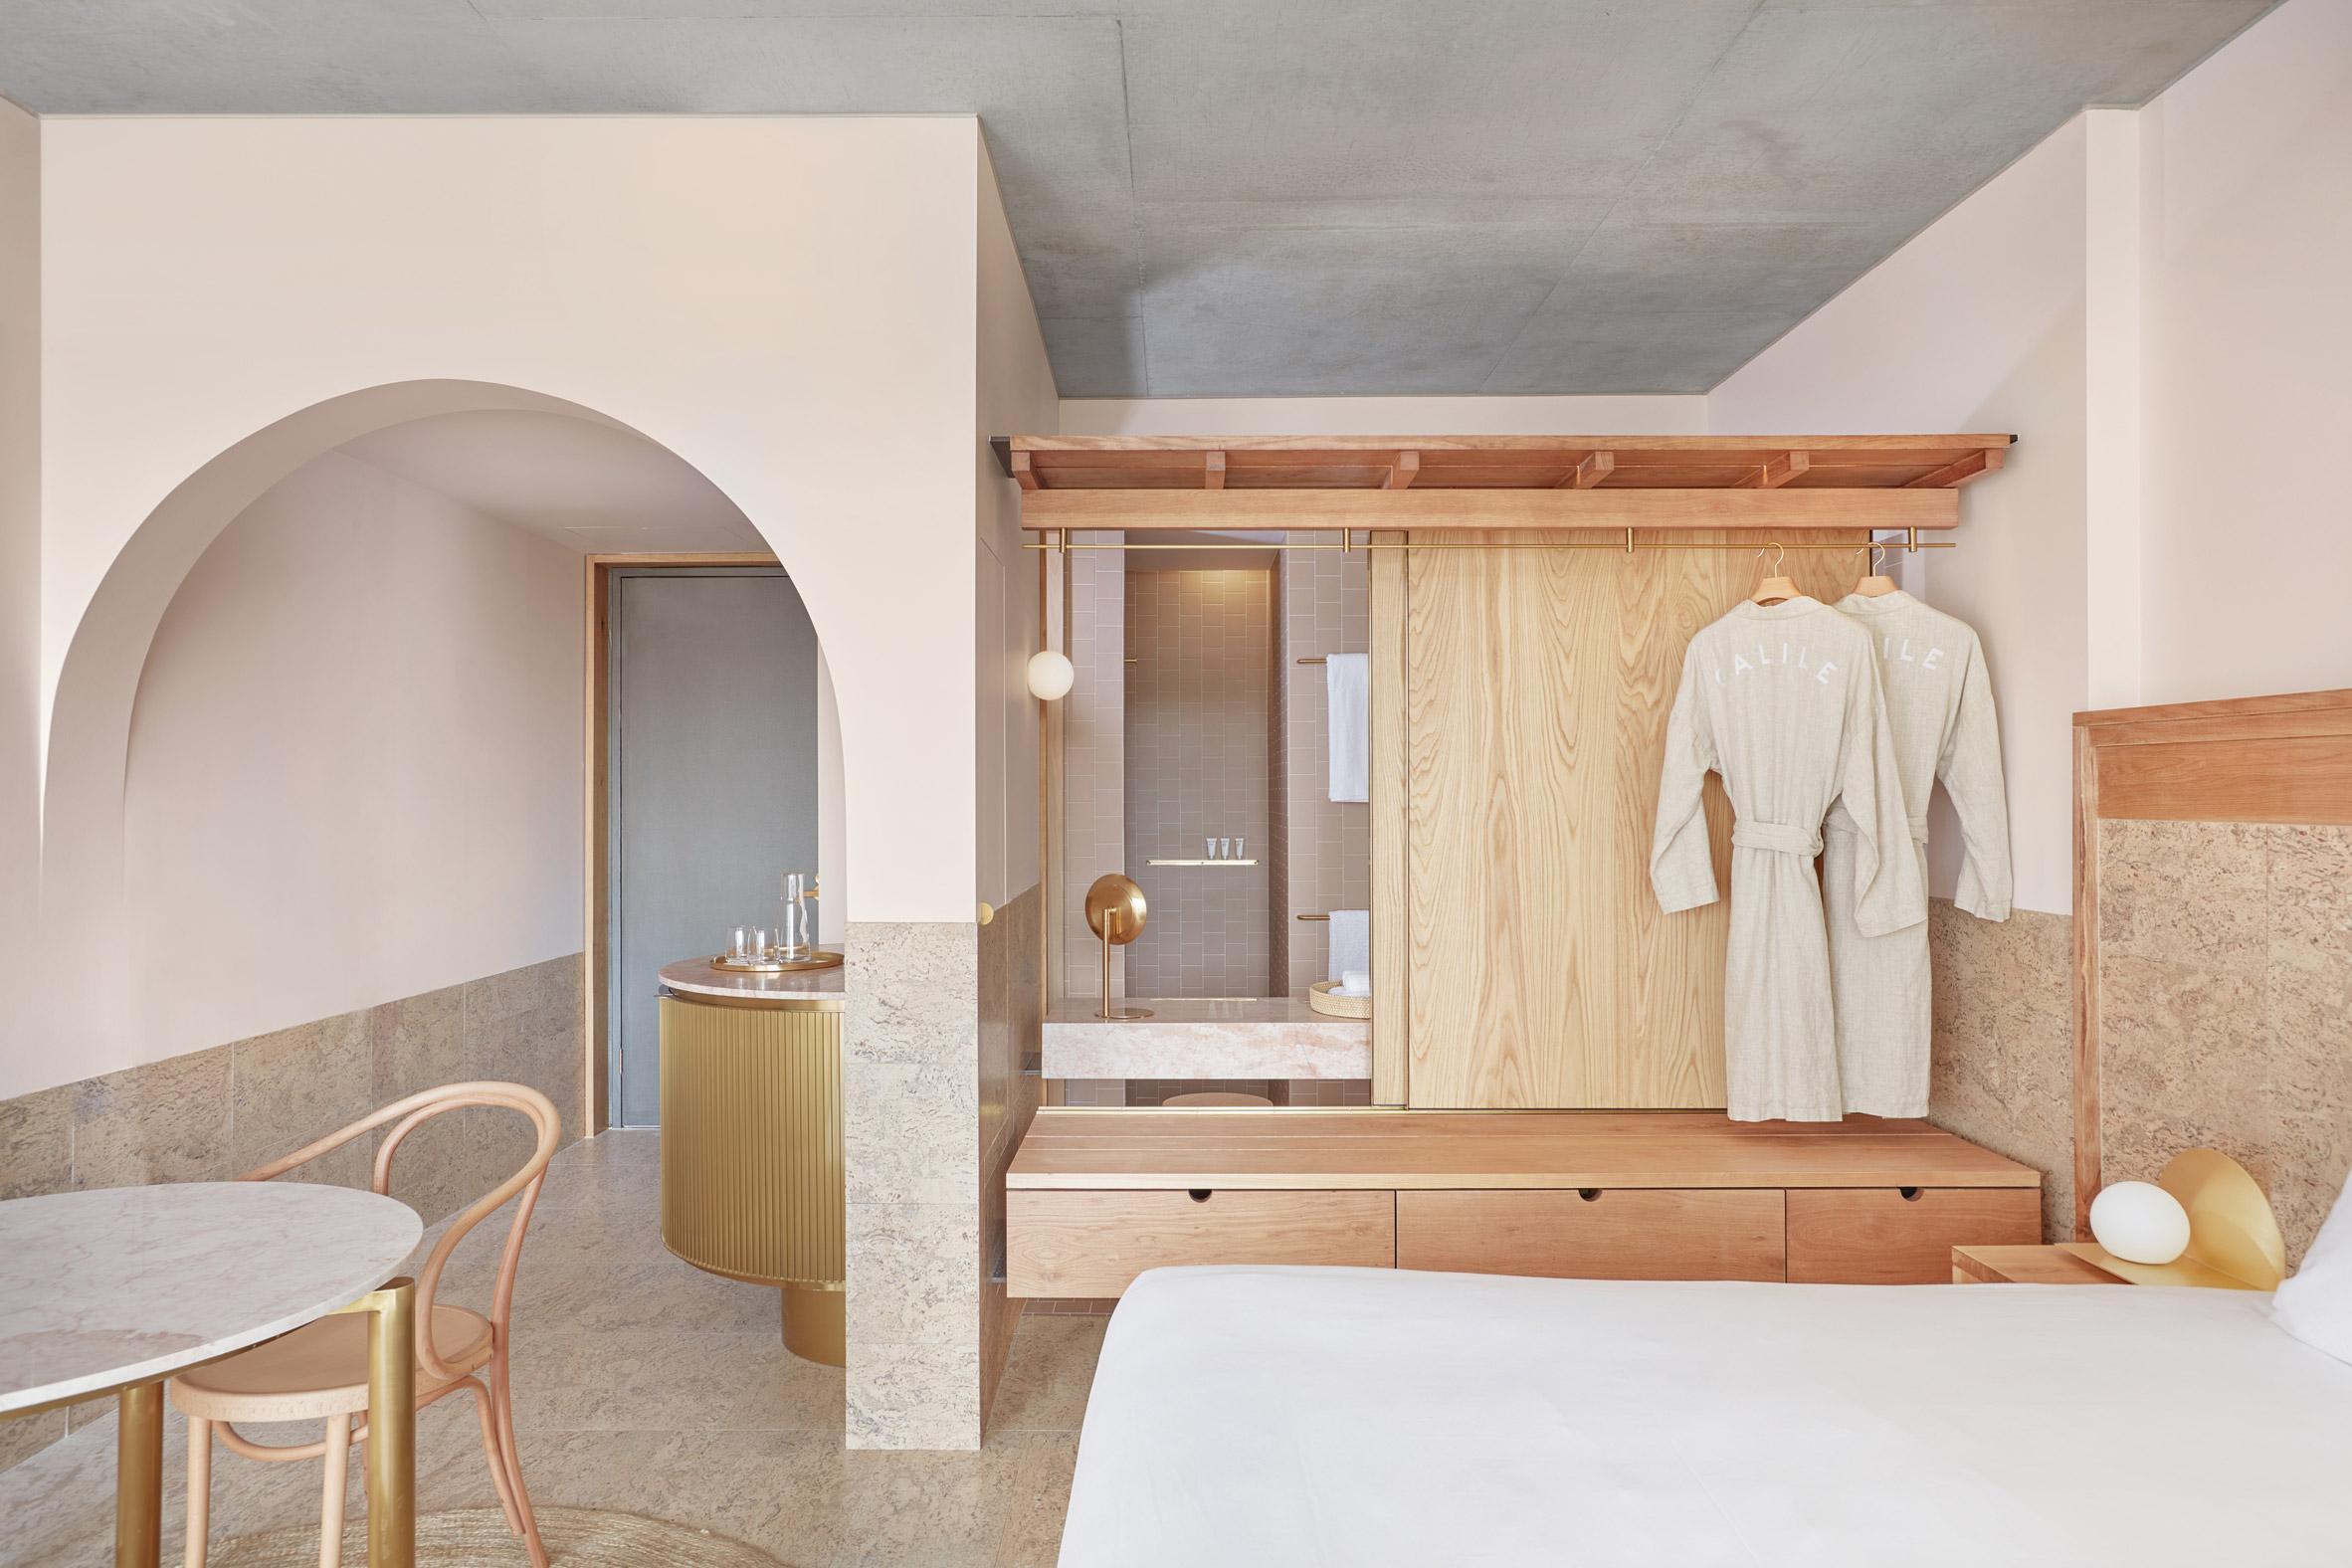 Calile Hotel Brisbane - Hotel Design Trends by LIV Design Studio